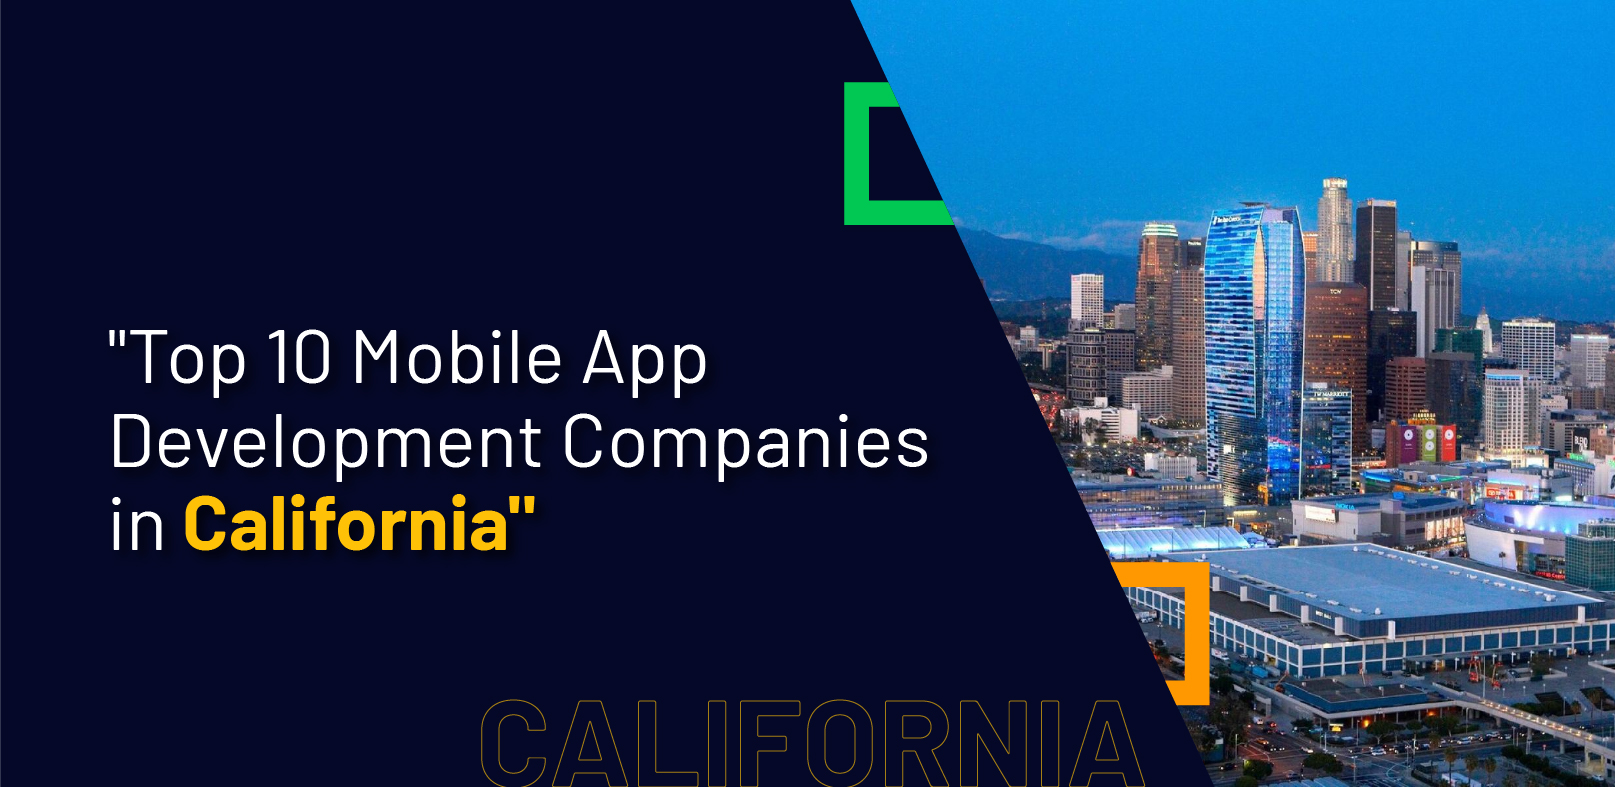 Top 10 Mobile App Development Companies in California - WebClues Infotech